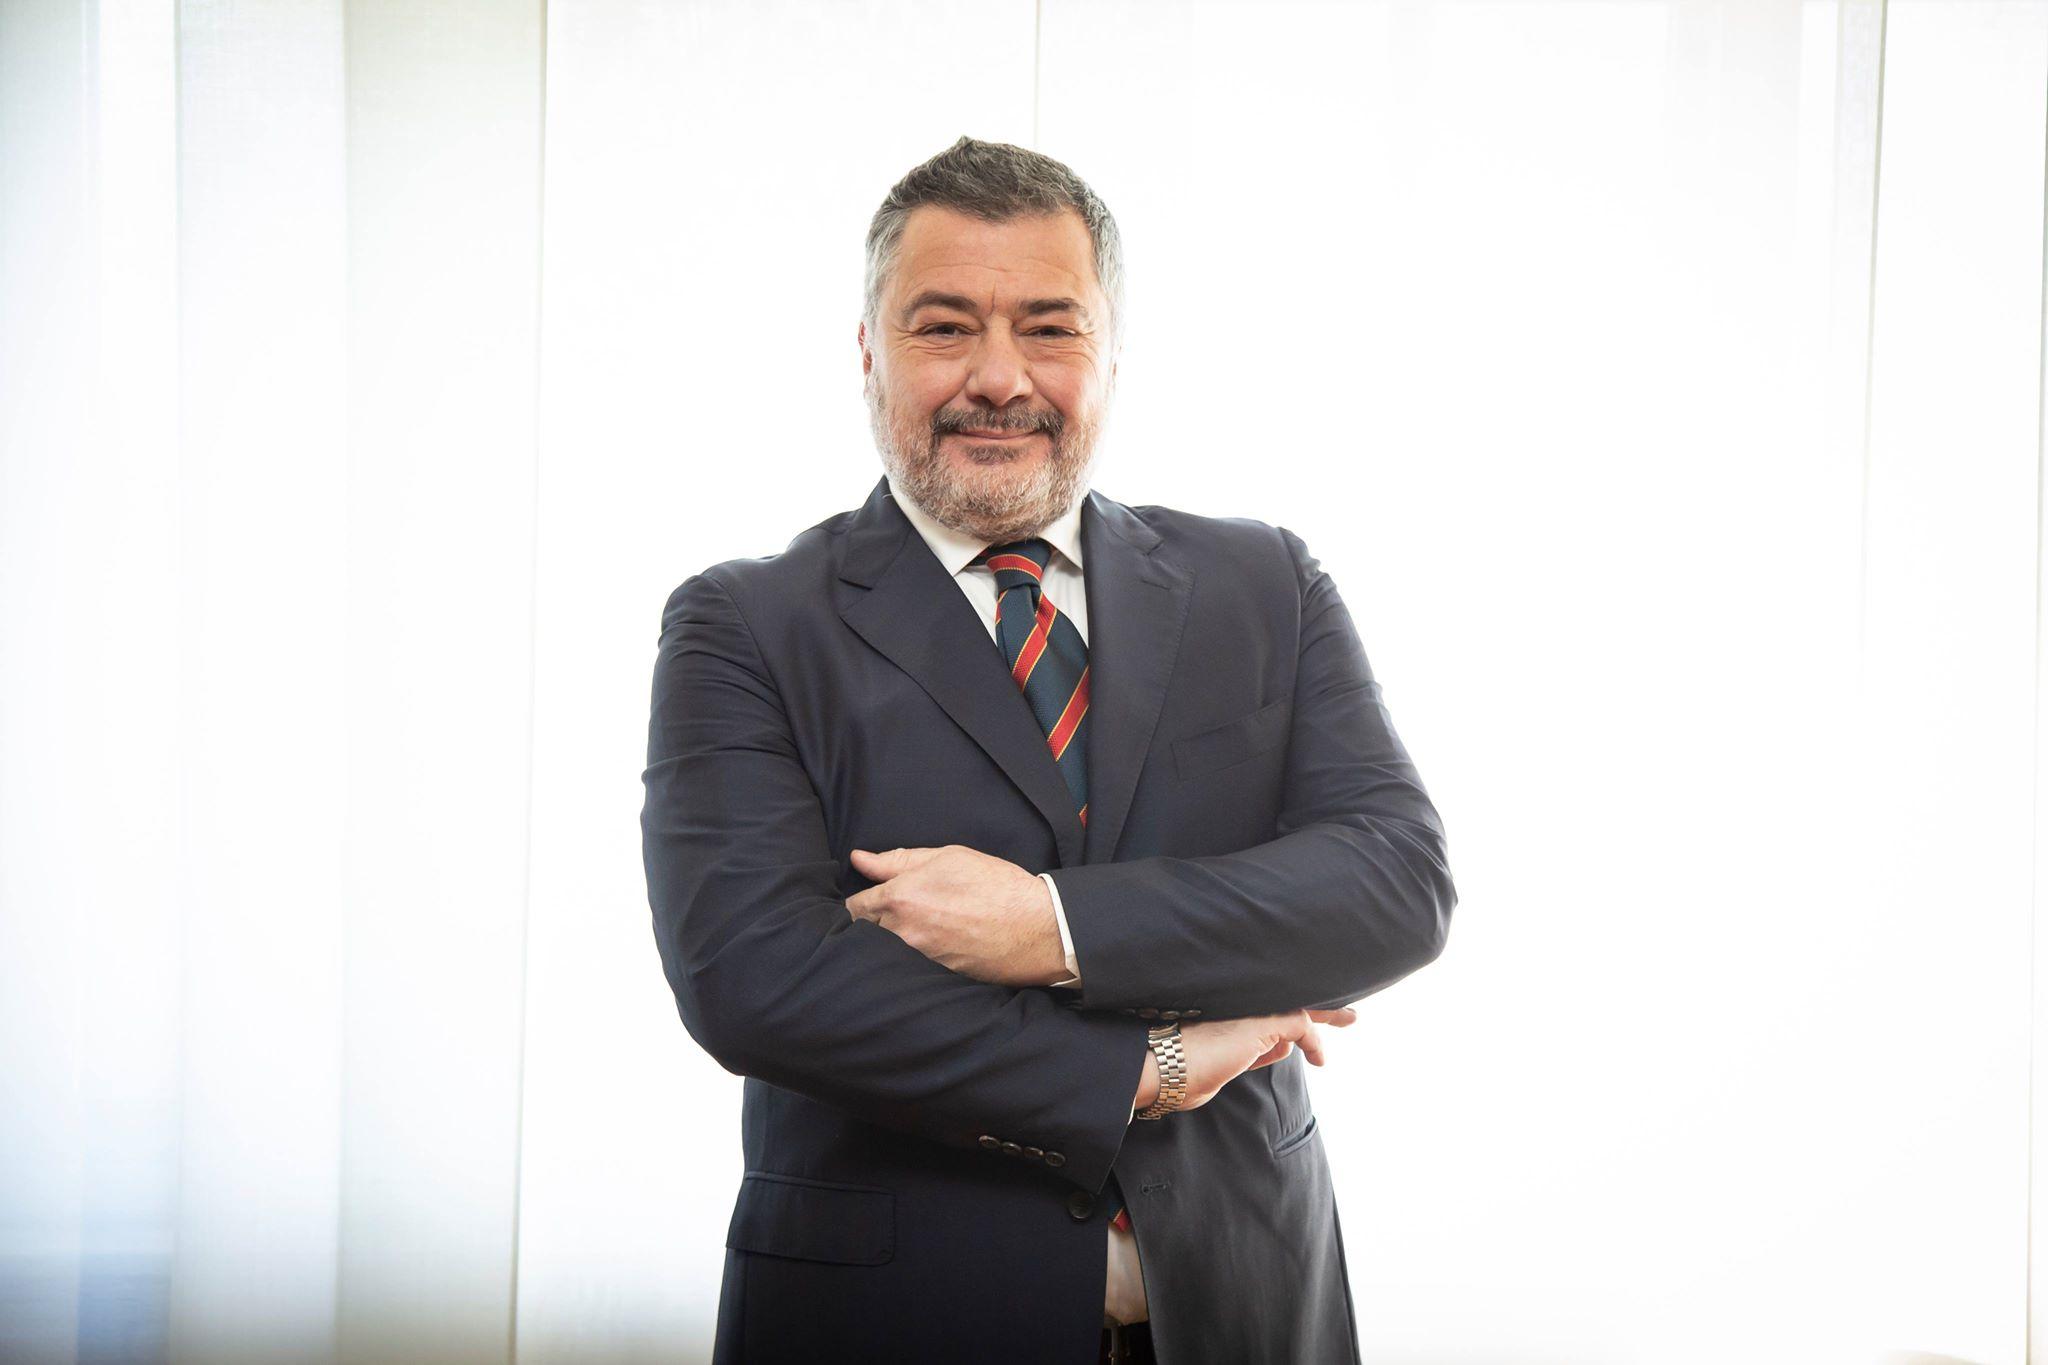 Pietro Fiocchi, eurodeputato di Fratelli d'Italia